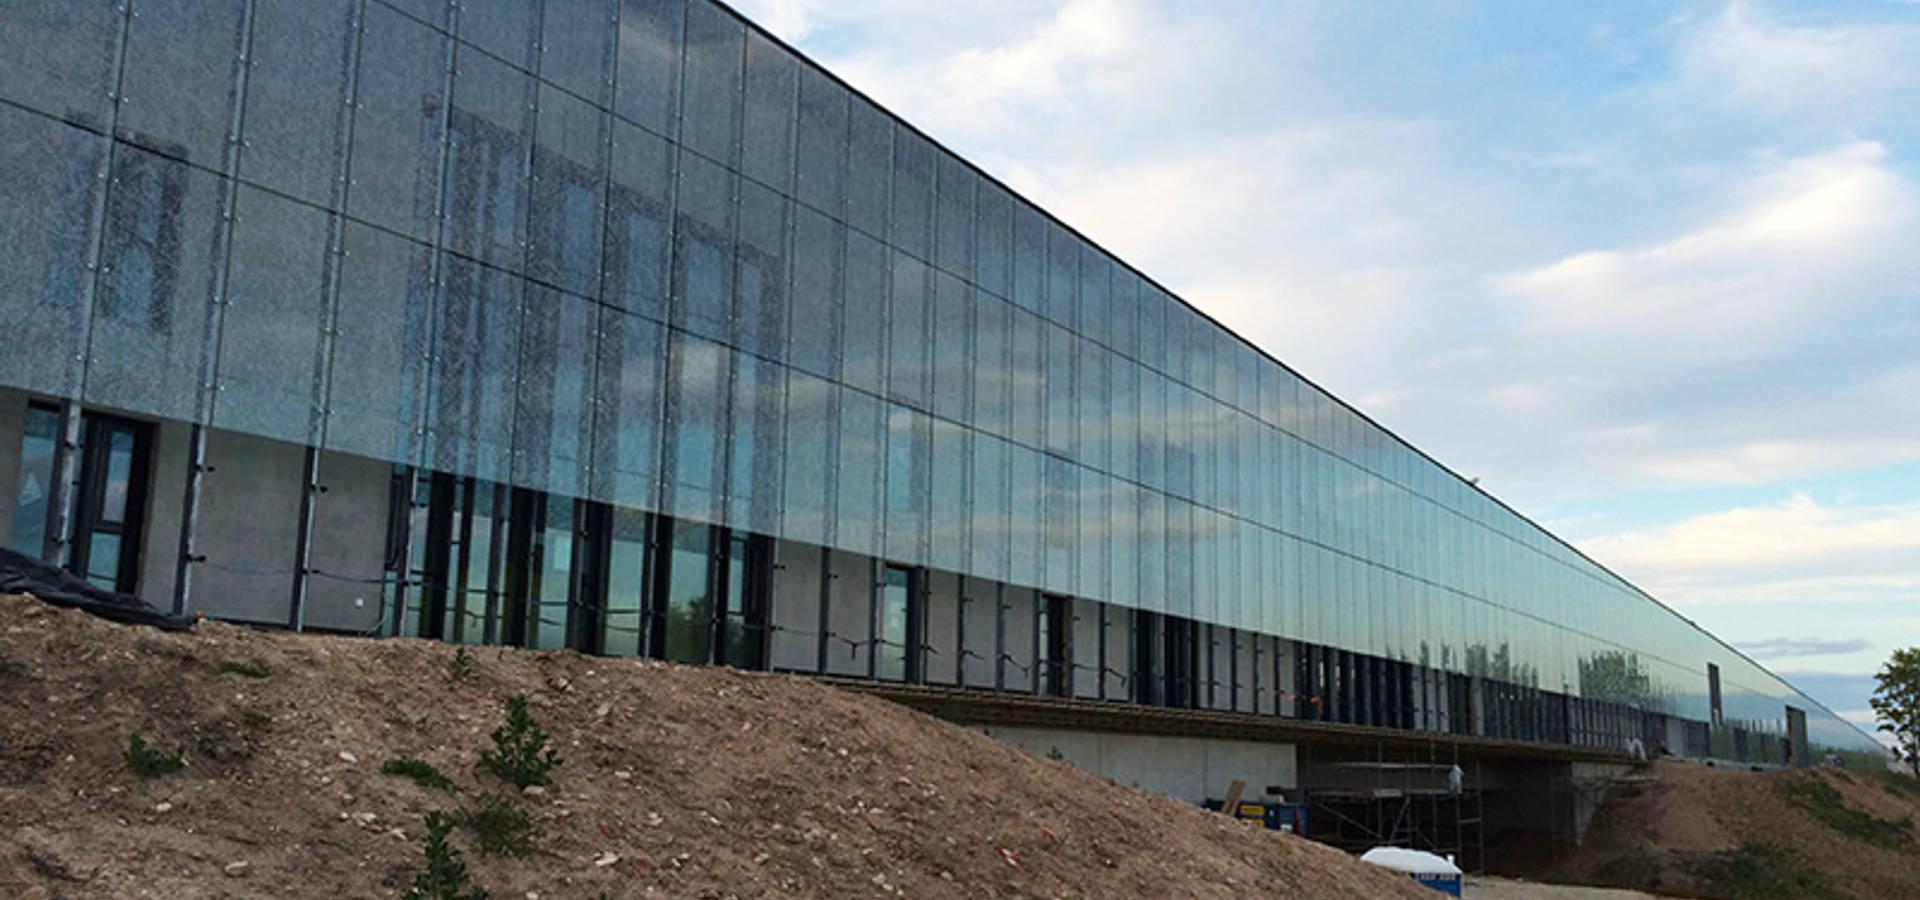 DGT. (Dorell.Ghotmeh.Tane/Architects)